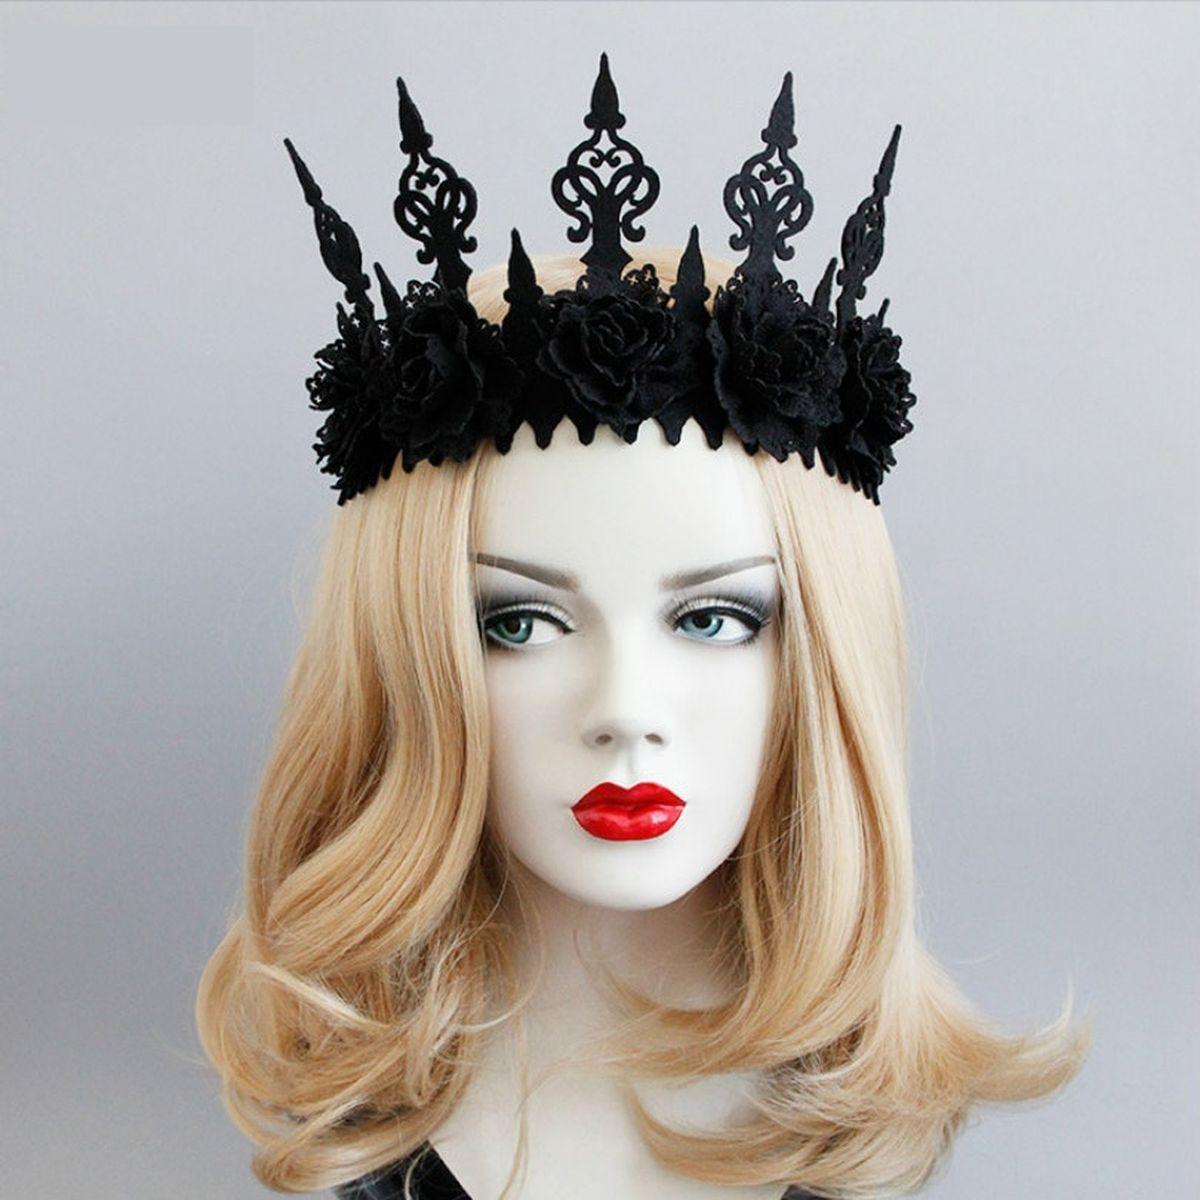 Neo Gothic Black Crown Tiara Headbands Halloween Cosplay Queen King Masquerade Festival Headband Headband Hairstyles Halloween Women